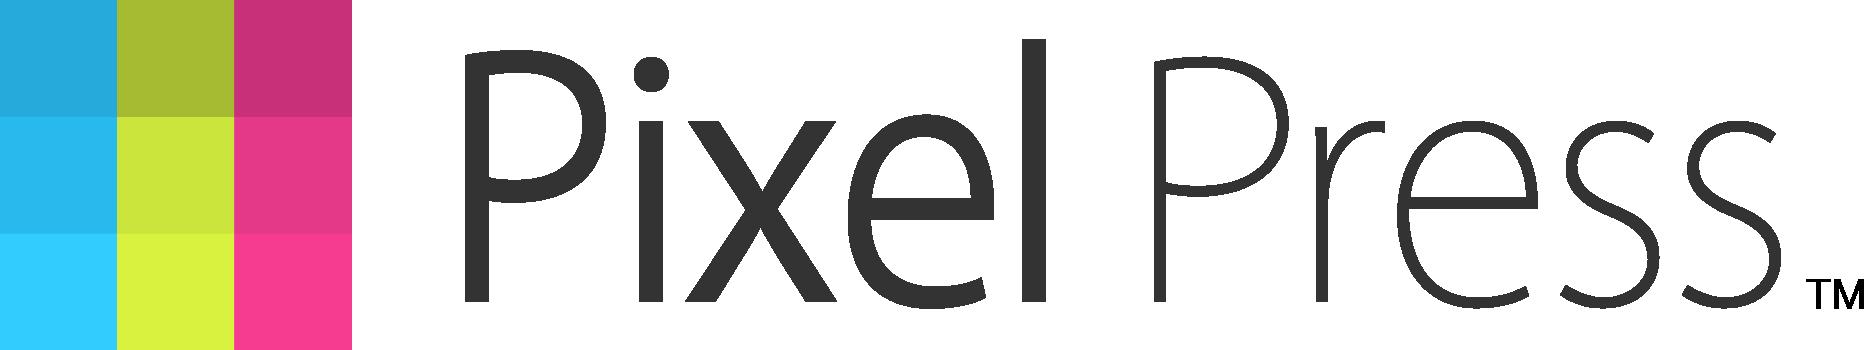 PixelPress-brand2.png